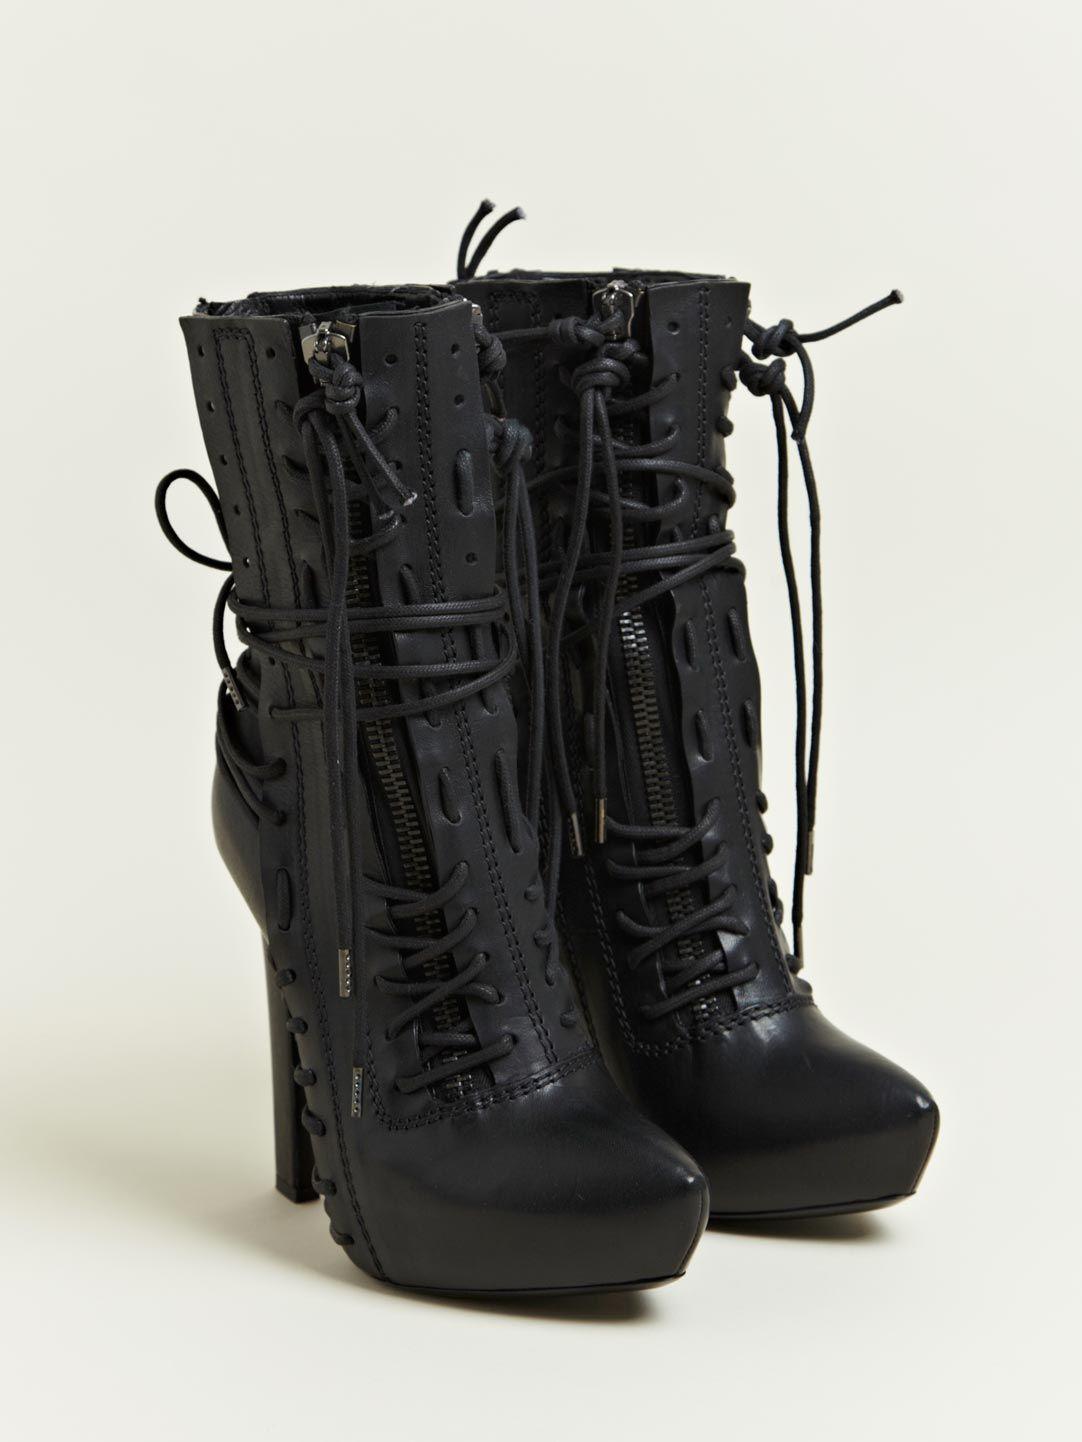 FOOTWEAR - Lace-up shoes Haider Ackermann rToIueX